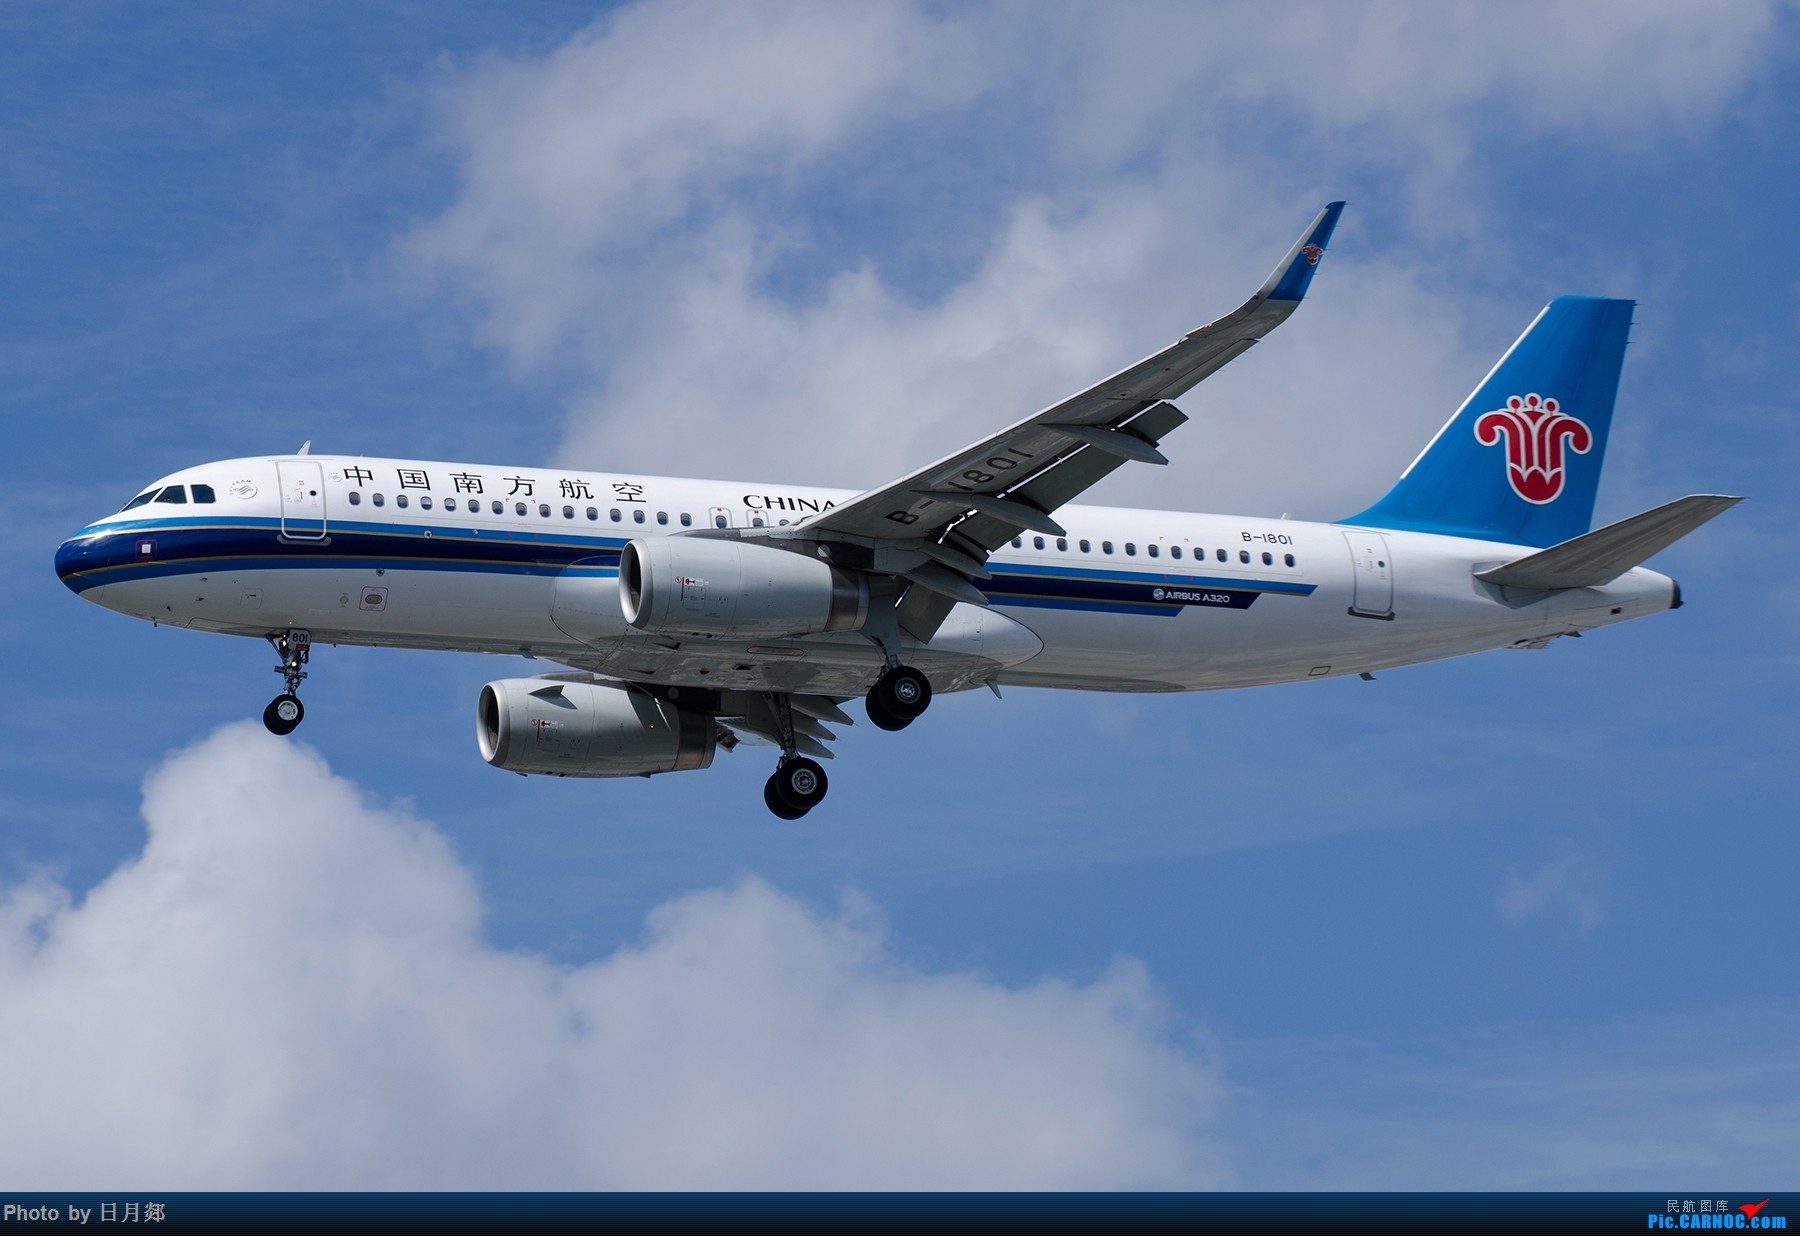 Re:[原创]【SHA拍机*1800大图】国庆的存货接着发,台风啥时候才能过去 AIRBUS A320-200 B-1801 中国上海虹桥国际机场